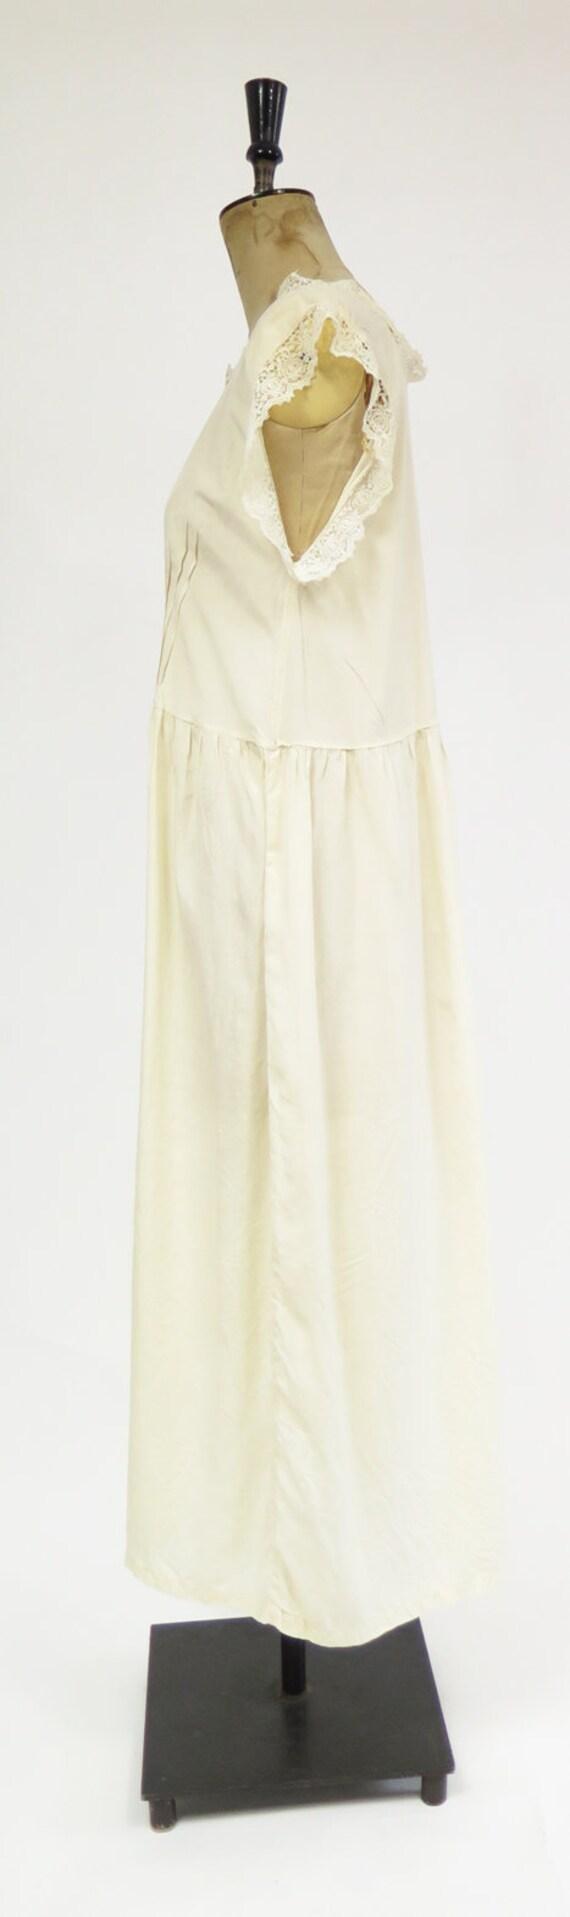 Original Vintage 1920s Deco Cream Silk And Lace D… - image 4